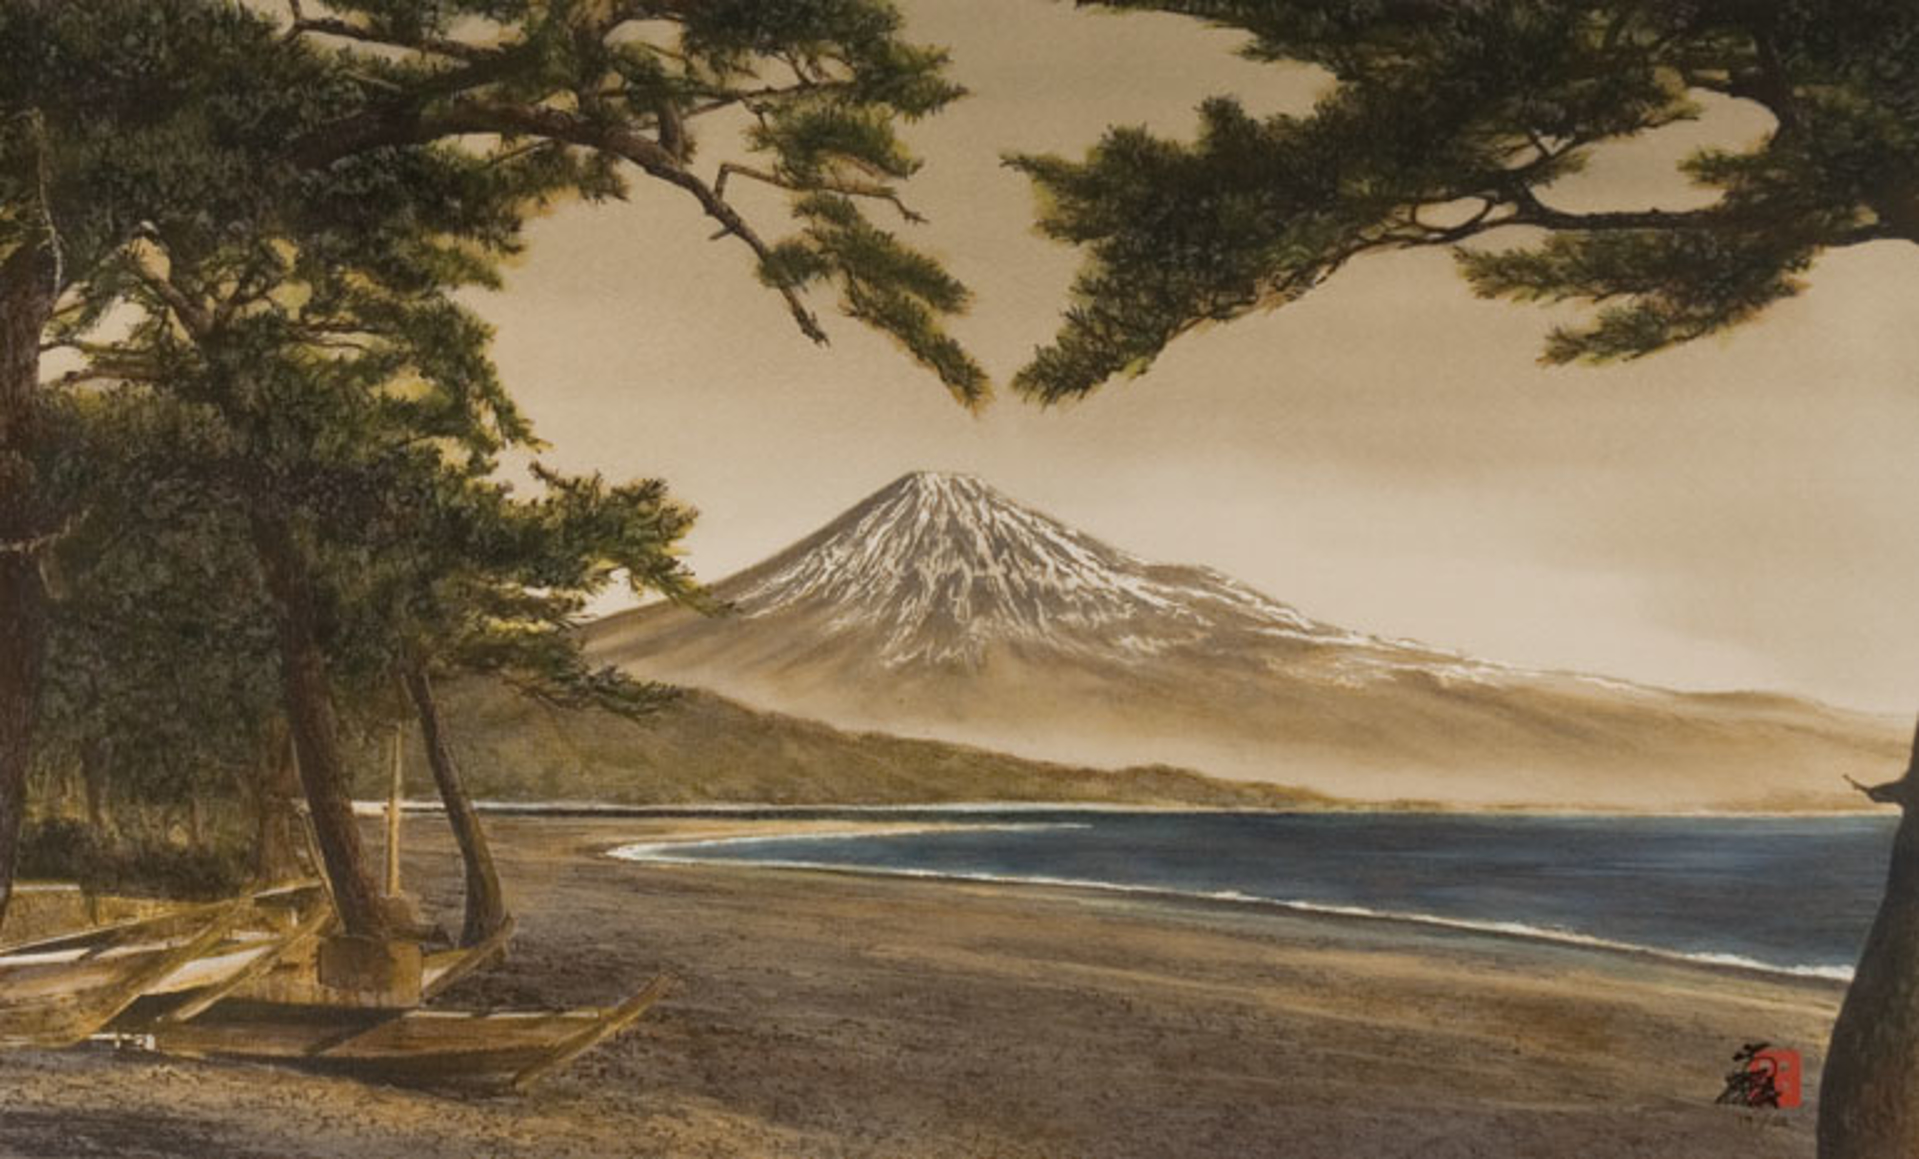 Inspiration (Fuji) by Hisashi Otsuka